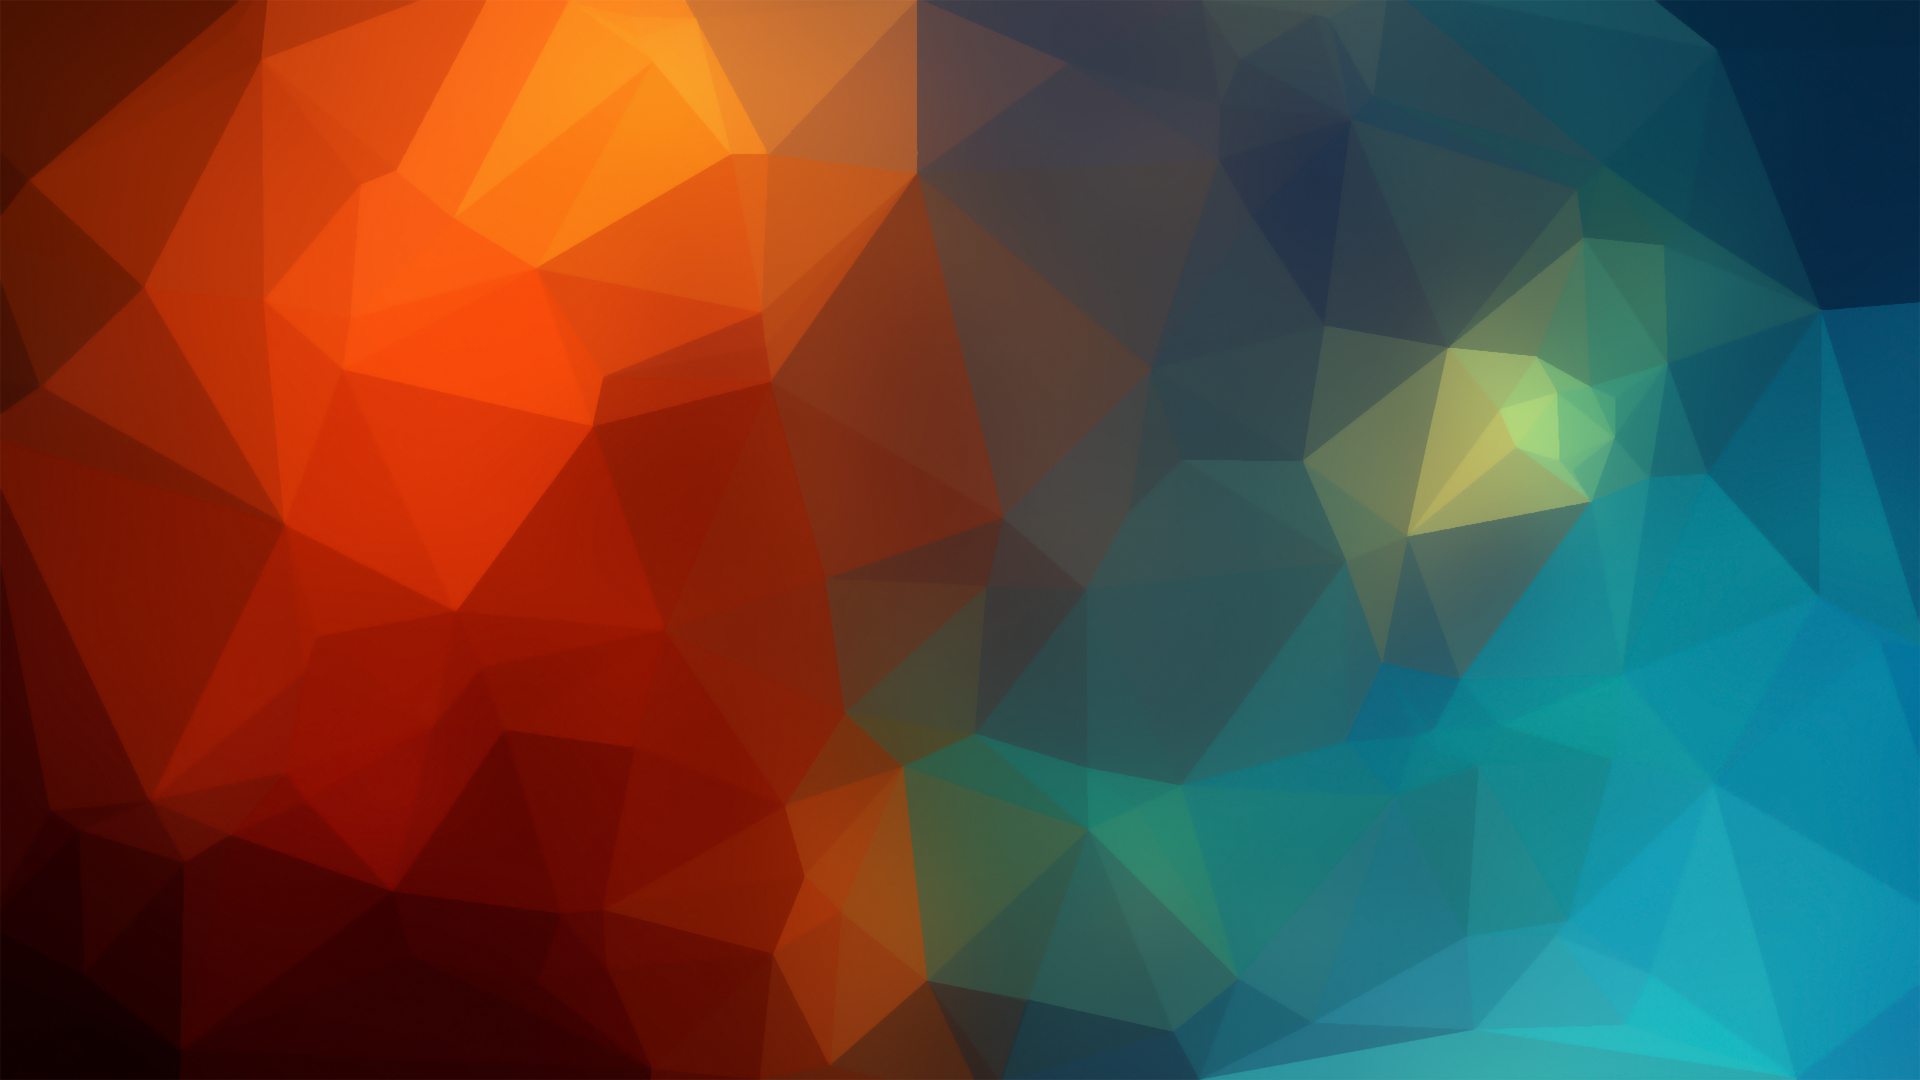 Wallpaper Geometric Polygon 4k Uhd By Airworldking On Deviantart